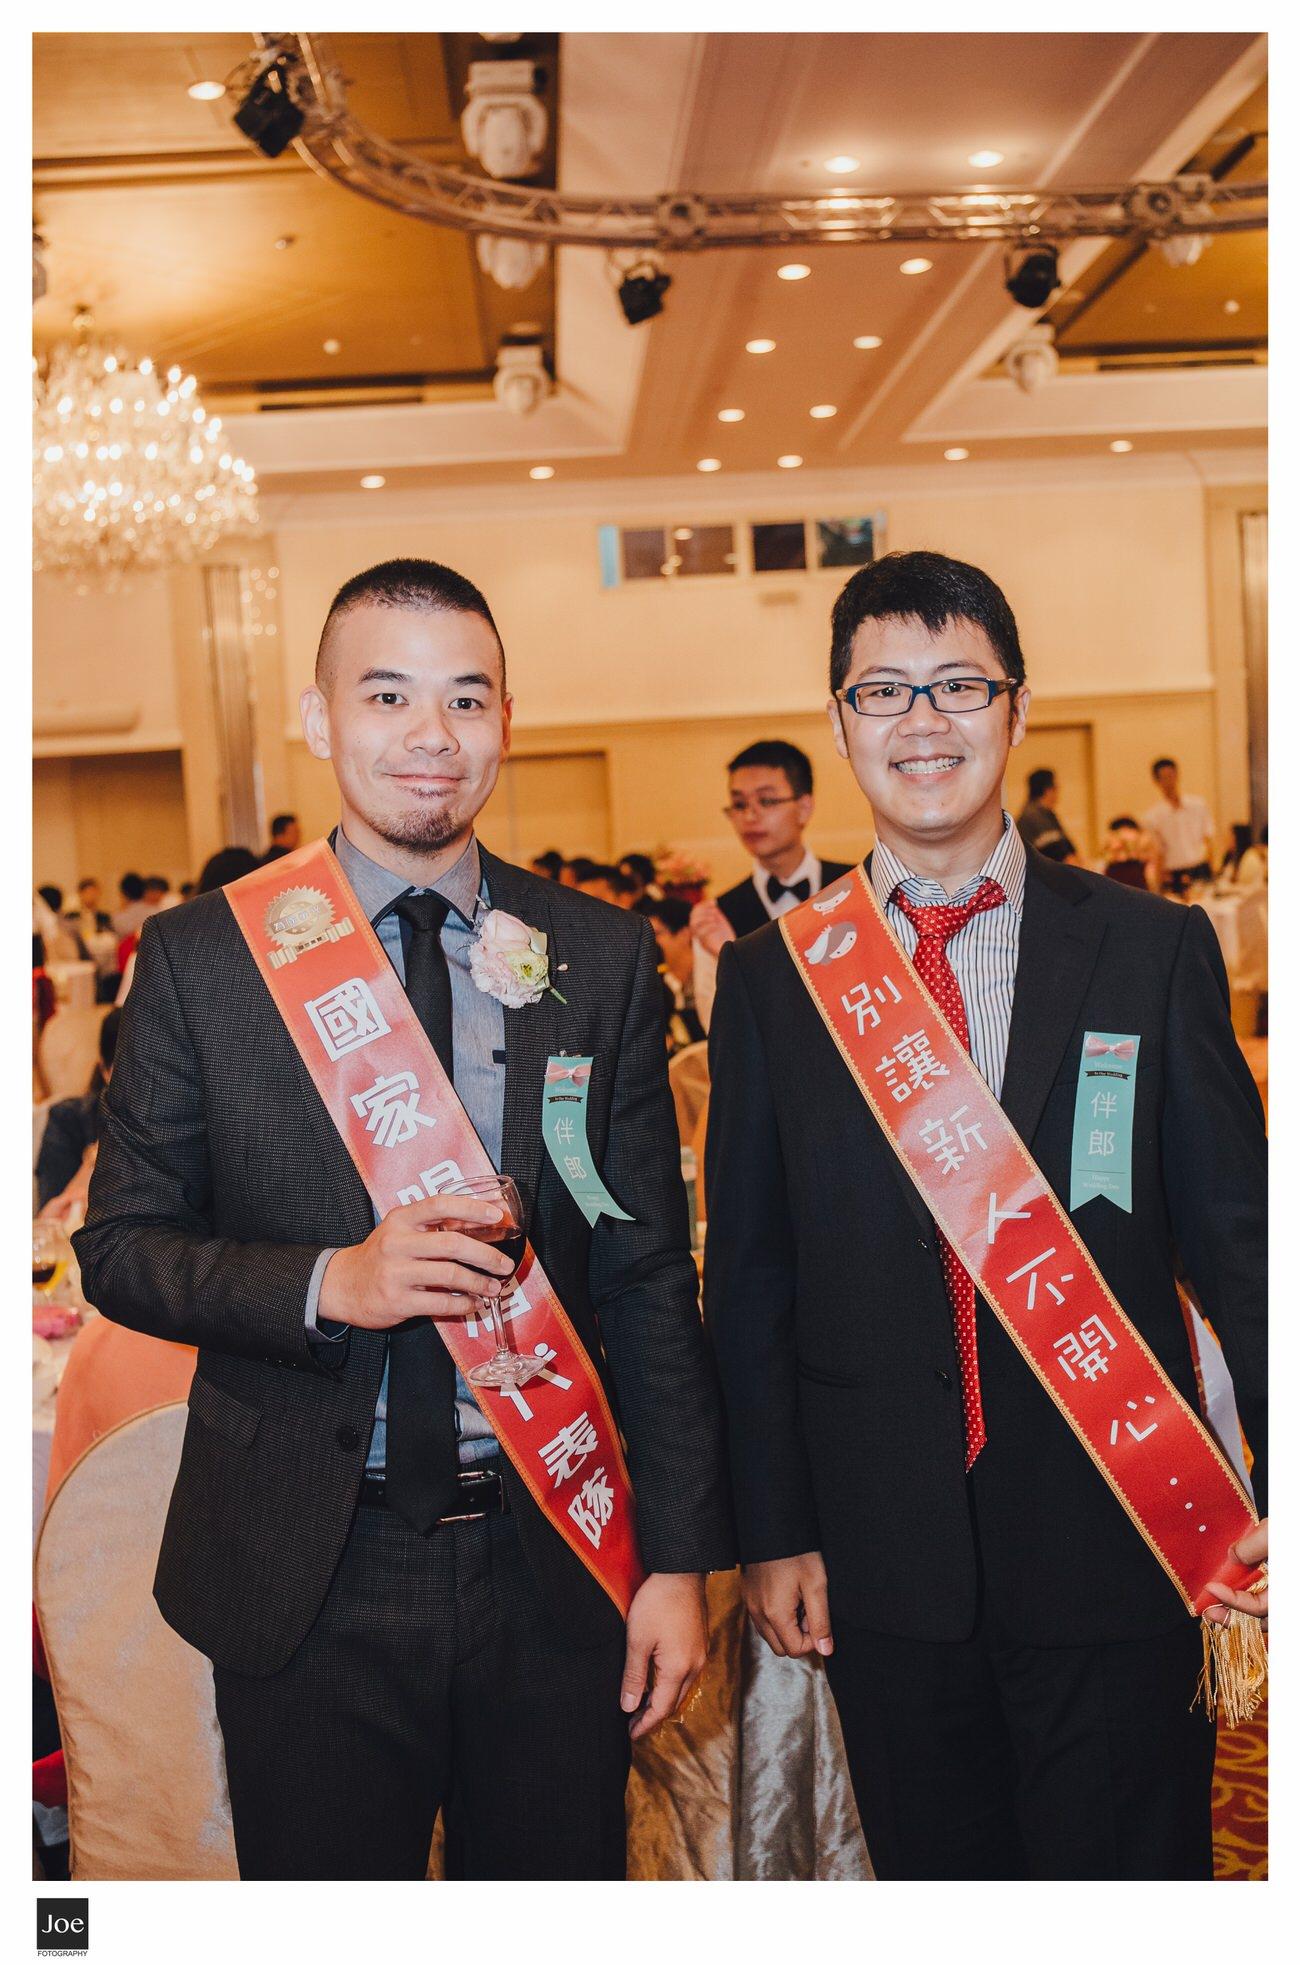 sunworld-dynasty-hotel-taipei-wedding-photo-joe-fotography-angel-jay-106.jpg